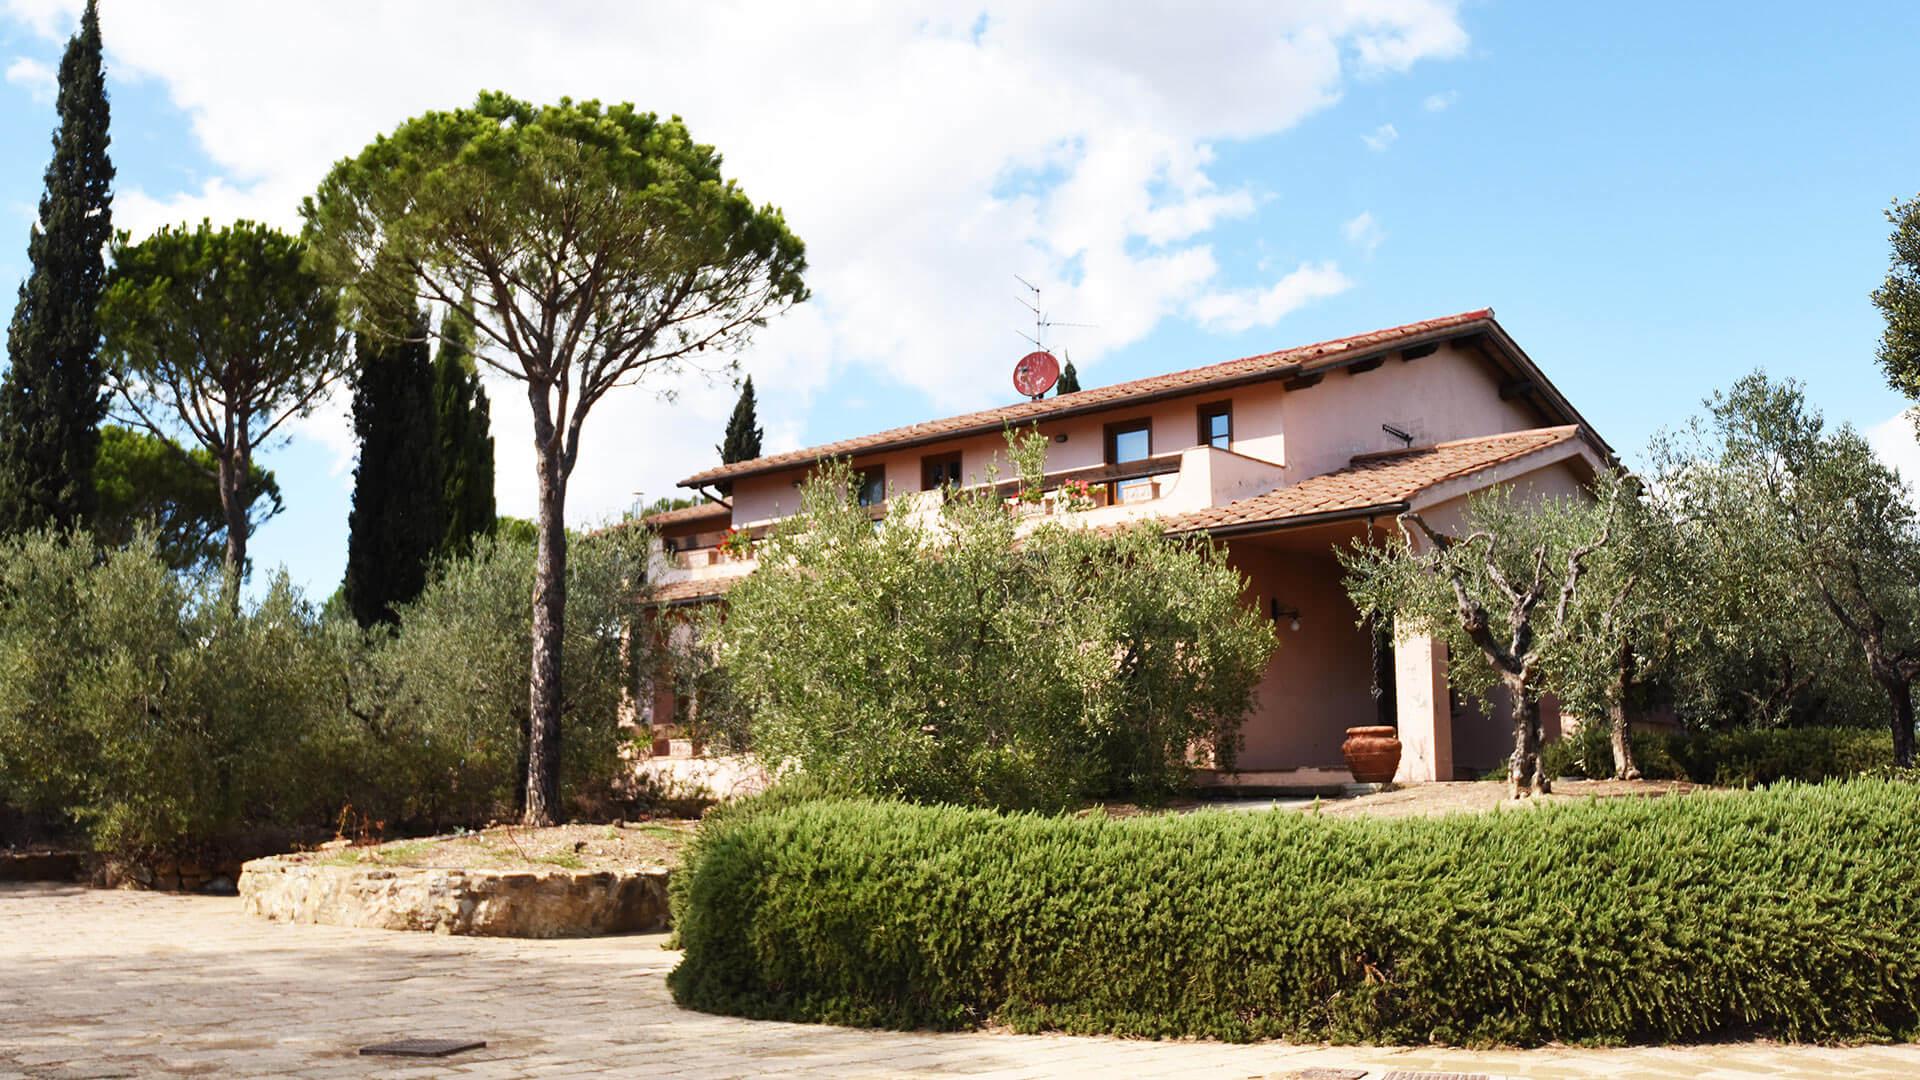 Villa Villa Valania, Rental in Tuscany